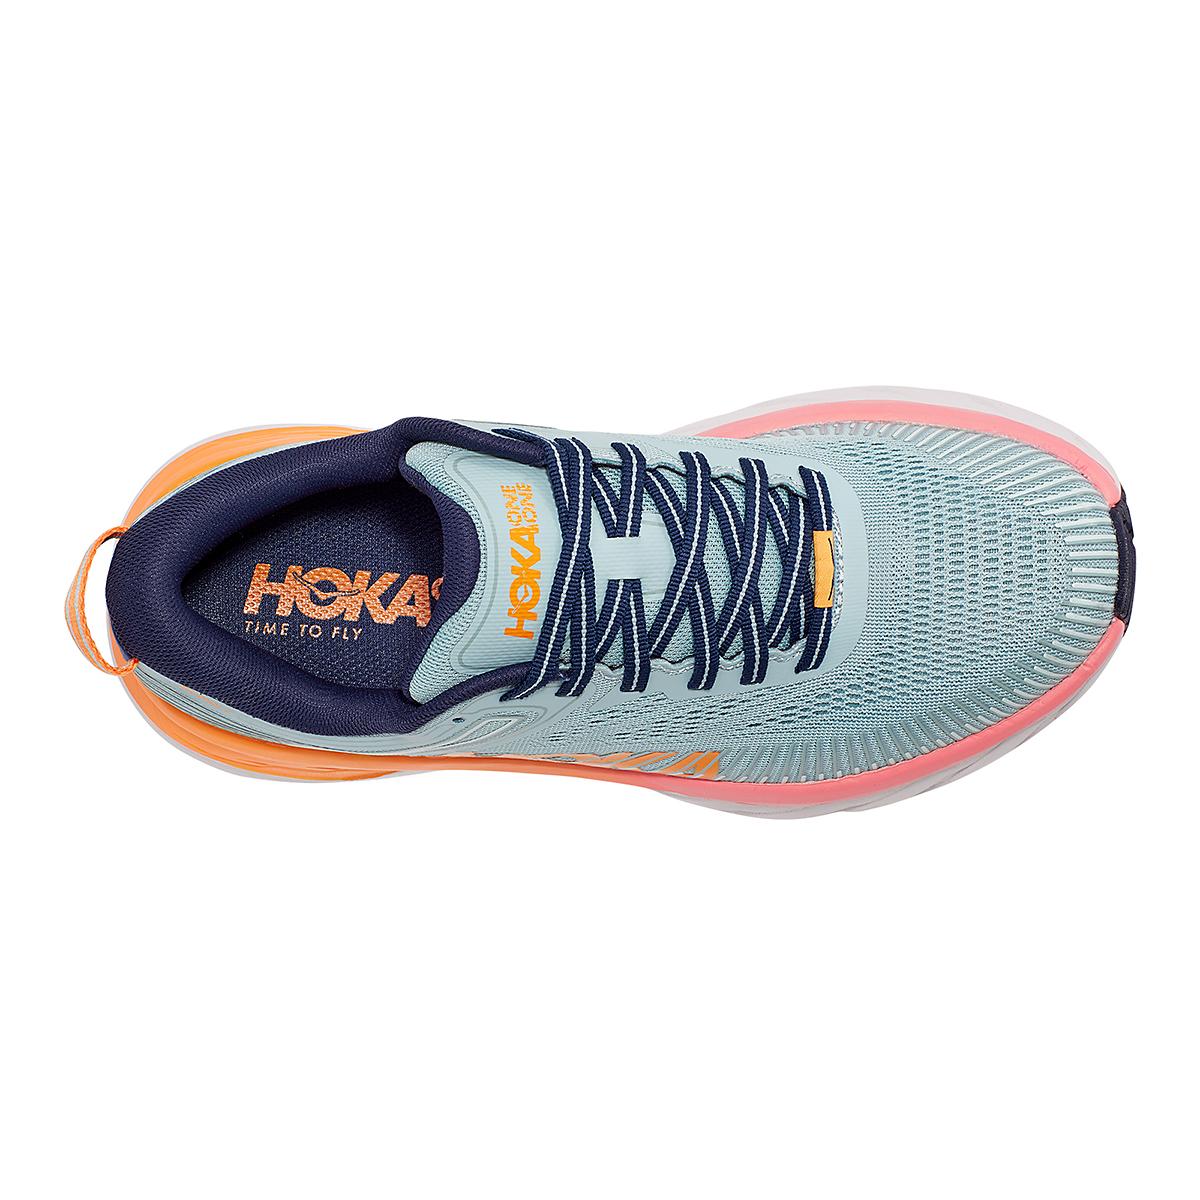 Women's Hoka One One Bondi 7 Running Shoe - Color: Blue Haze/Black Iris - Size: 5.5 - Width: Regular, Blue Haze/Black Iris, large, image 7